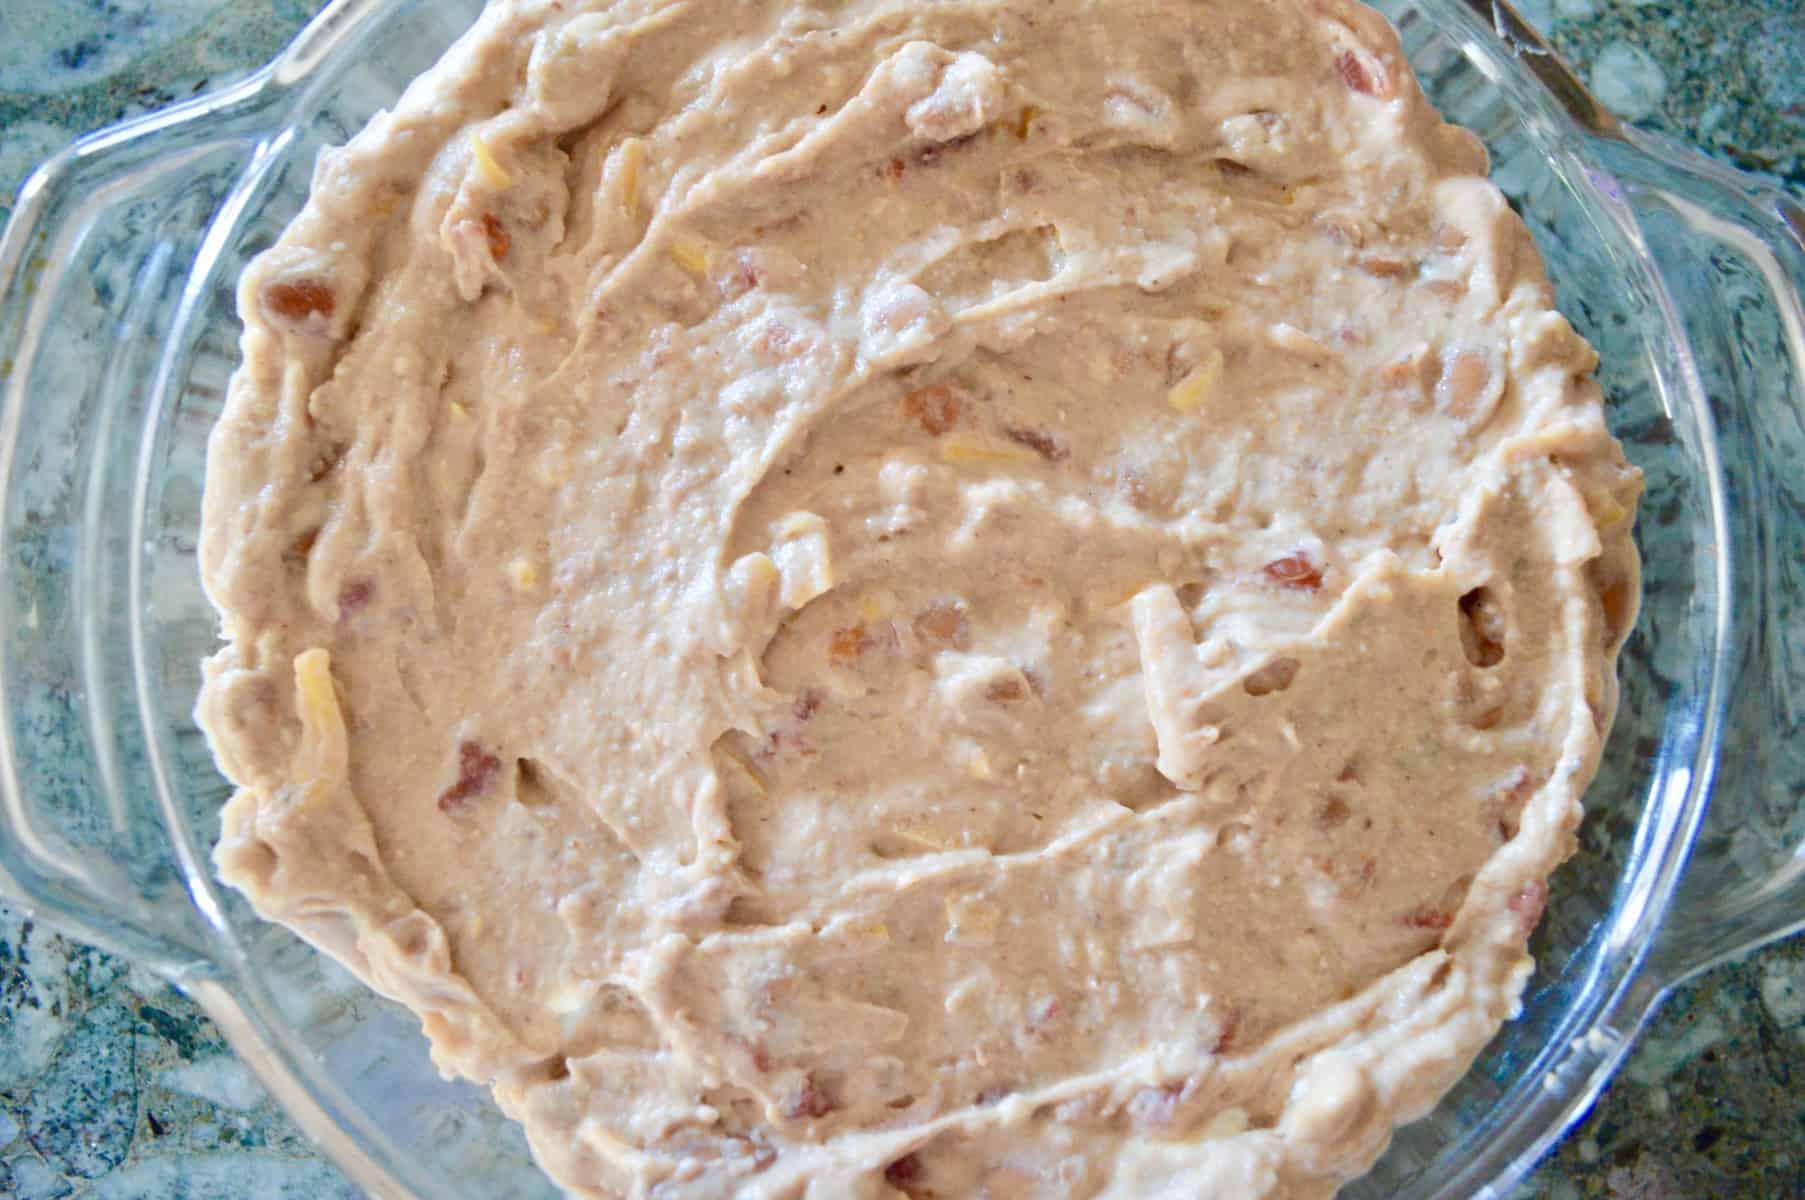 dip in a baking dish